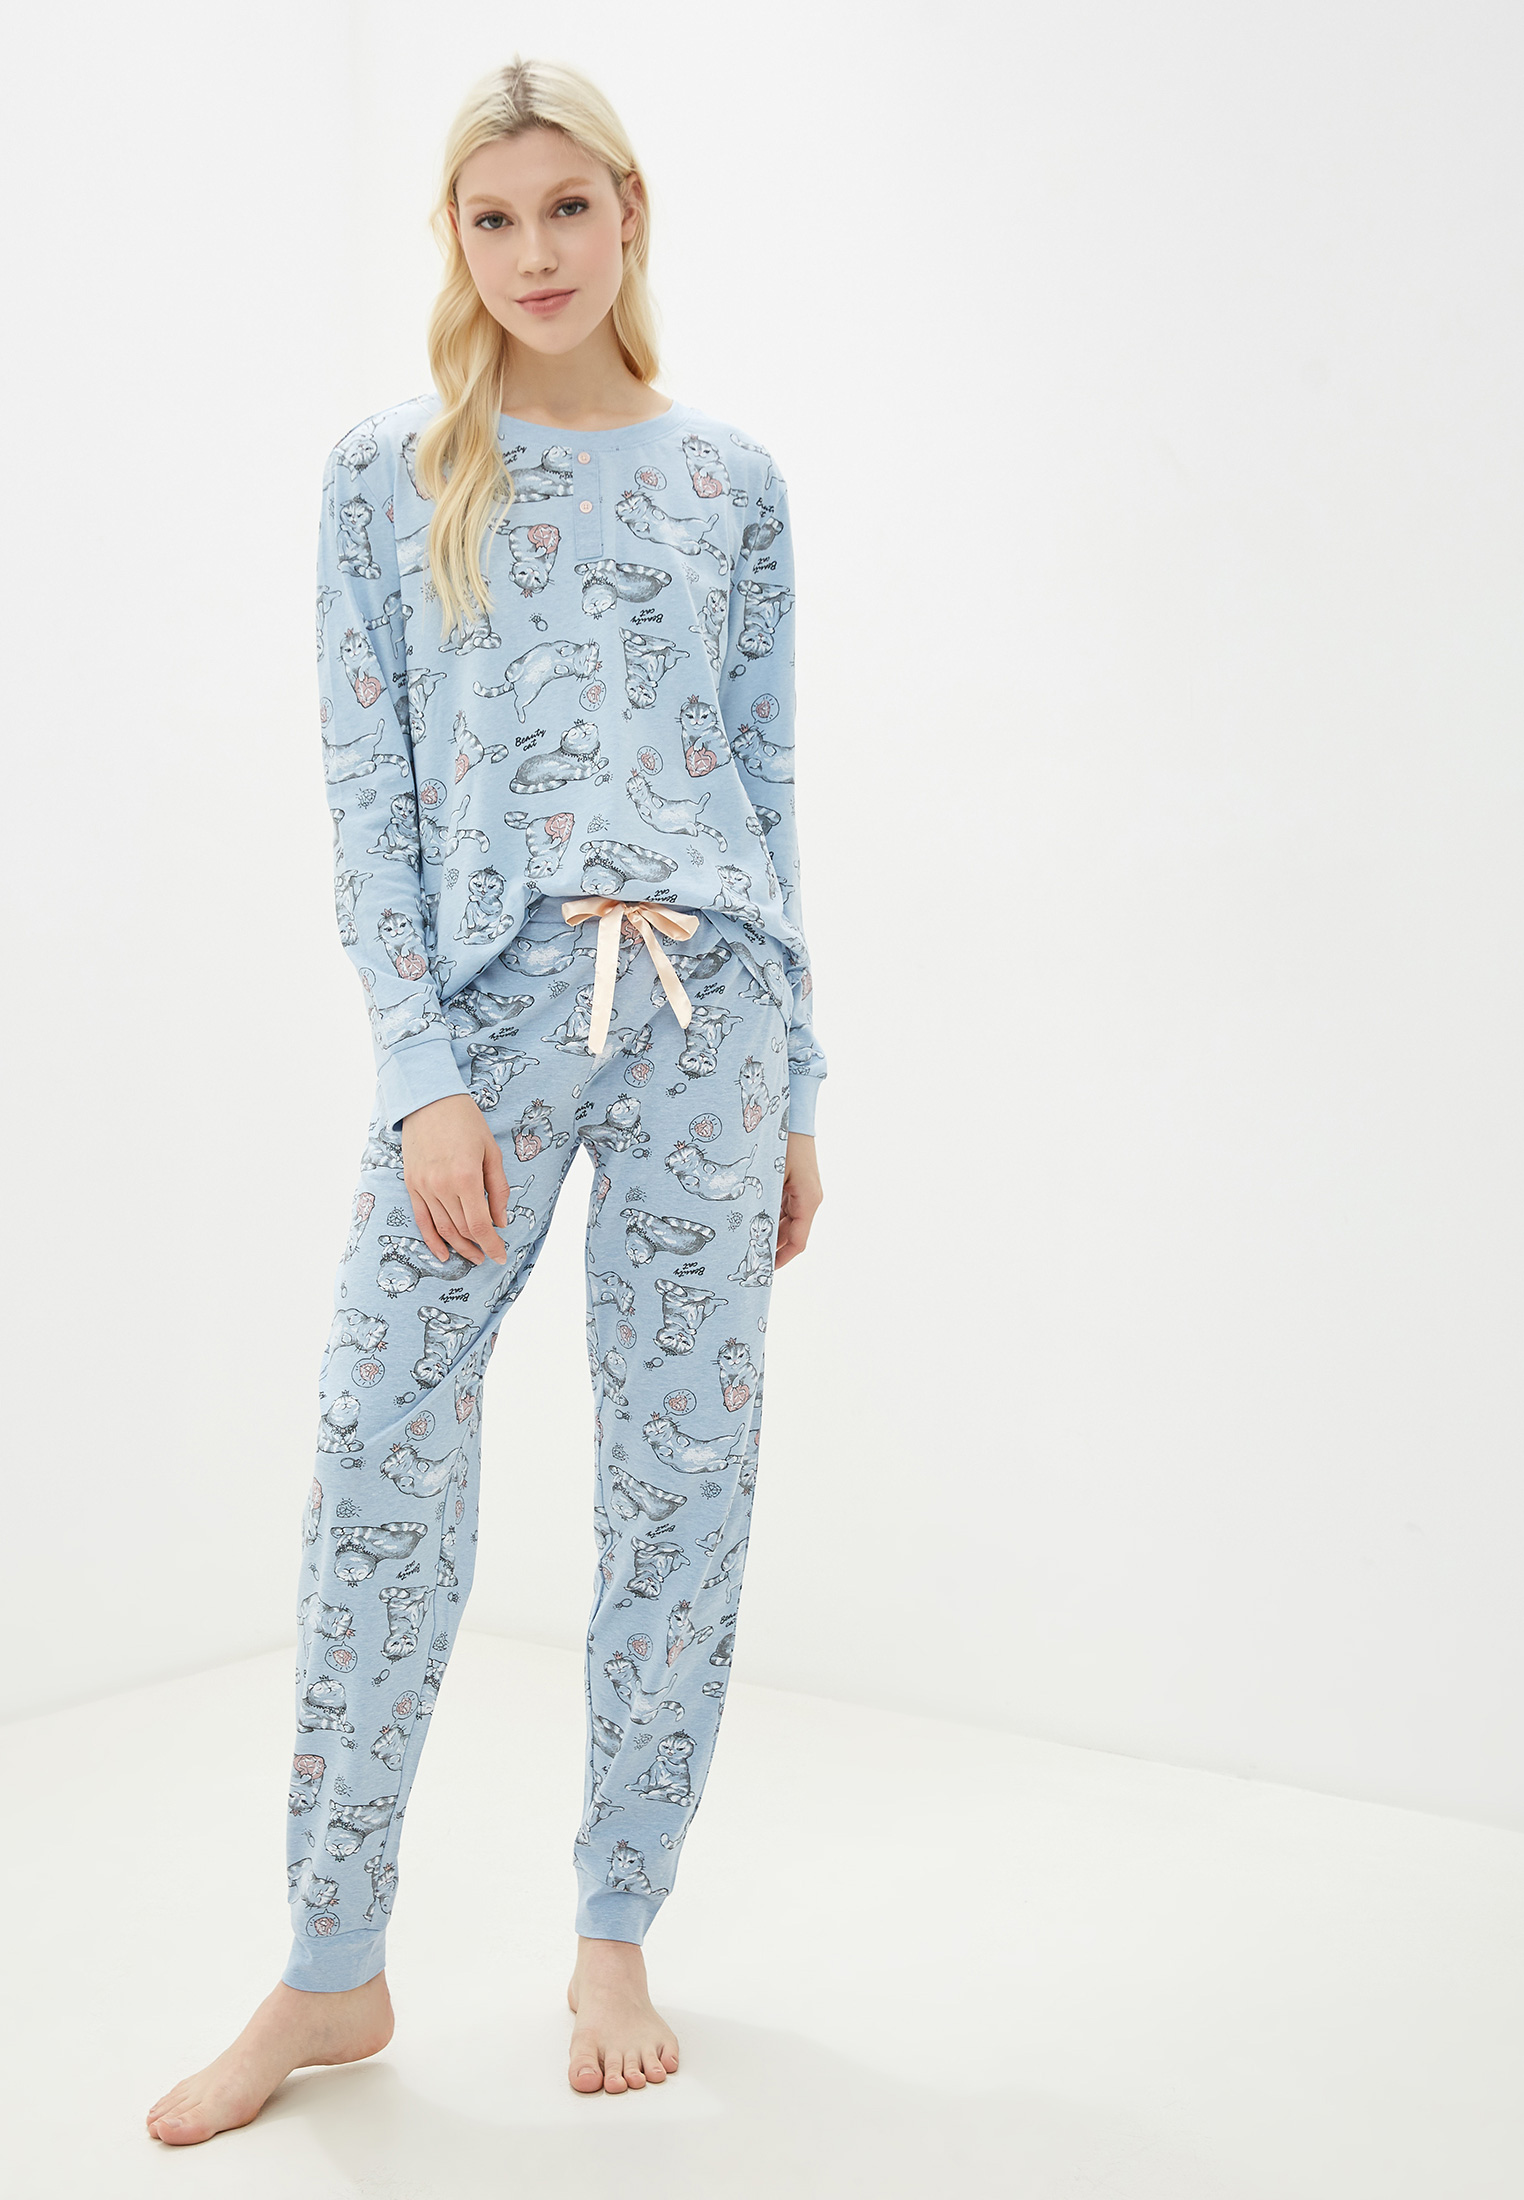 Пижама Sela купить за 45.90 р. в интернет-магазине Lamoda.by